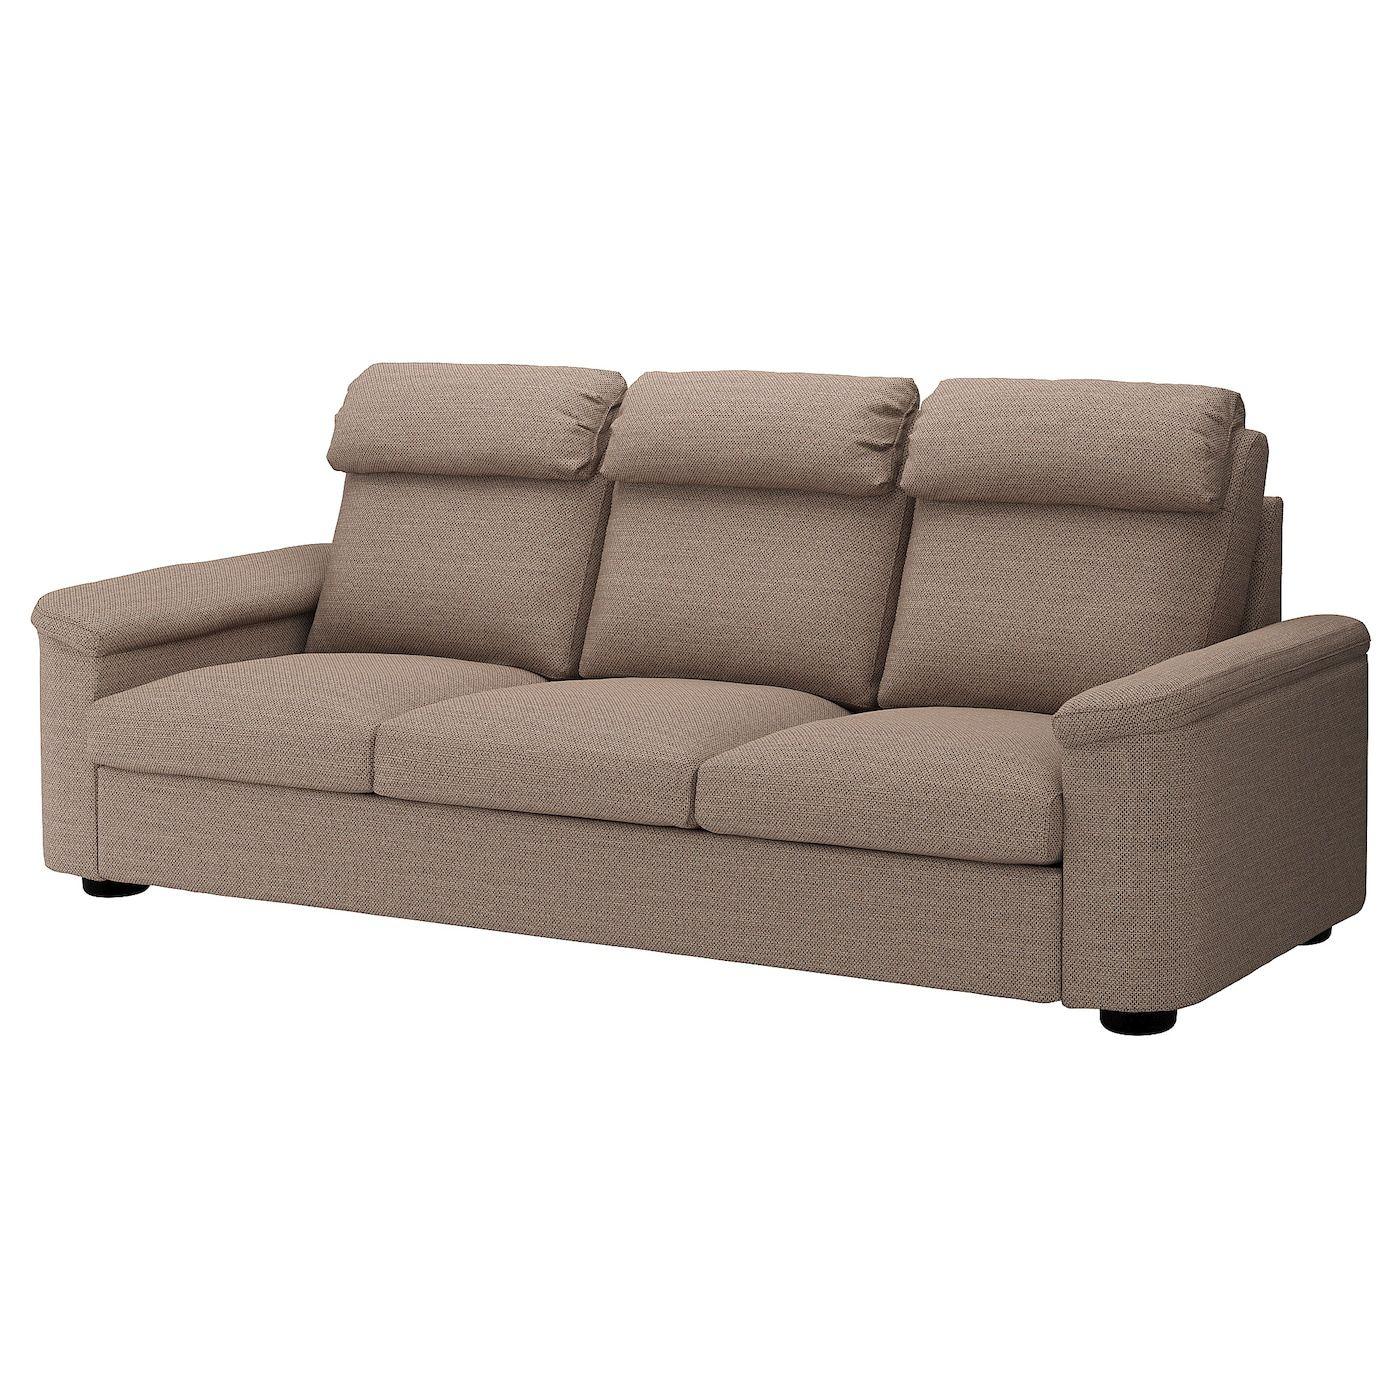 Lidhult Sofa Lejde Beige Brown Sofa Sofa Frame Ikea